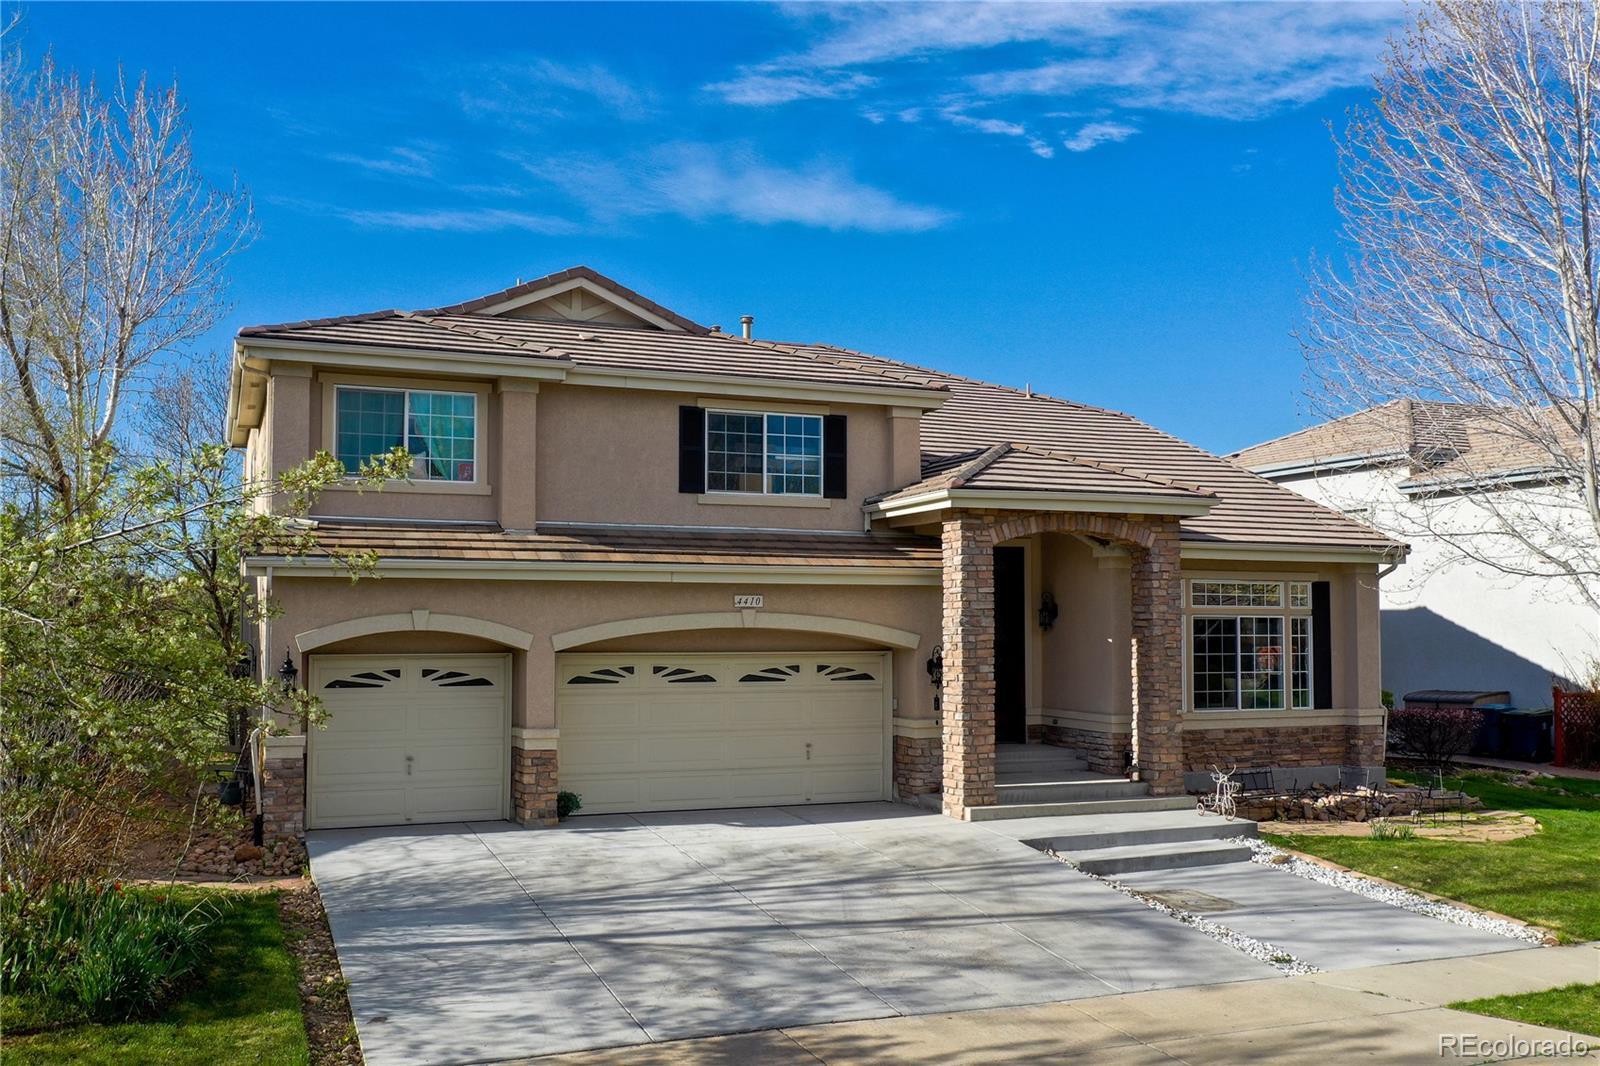 4410 Crestone Circle Property Photo - Broomfield, CO real estate listing